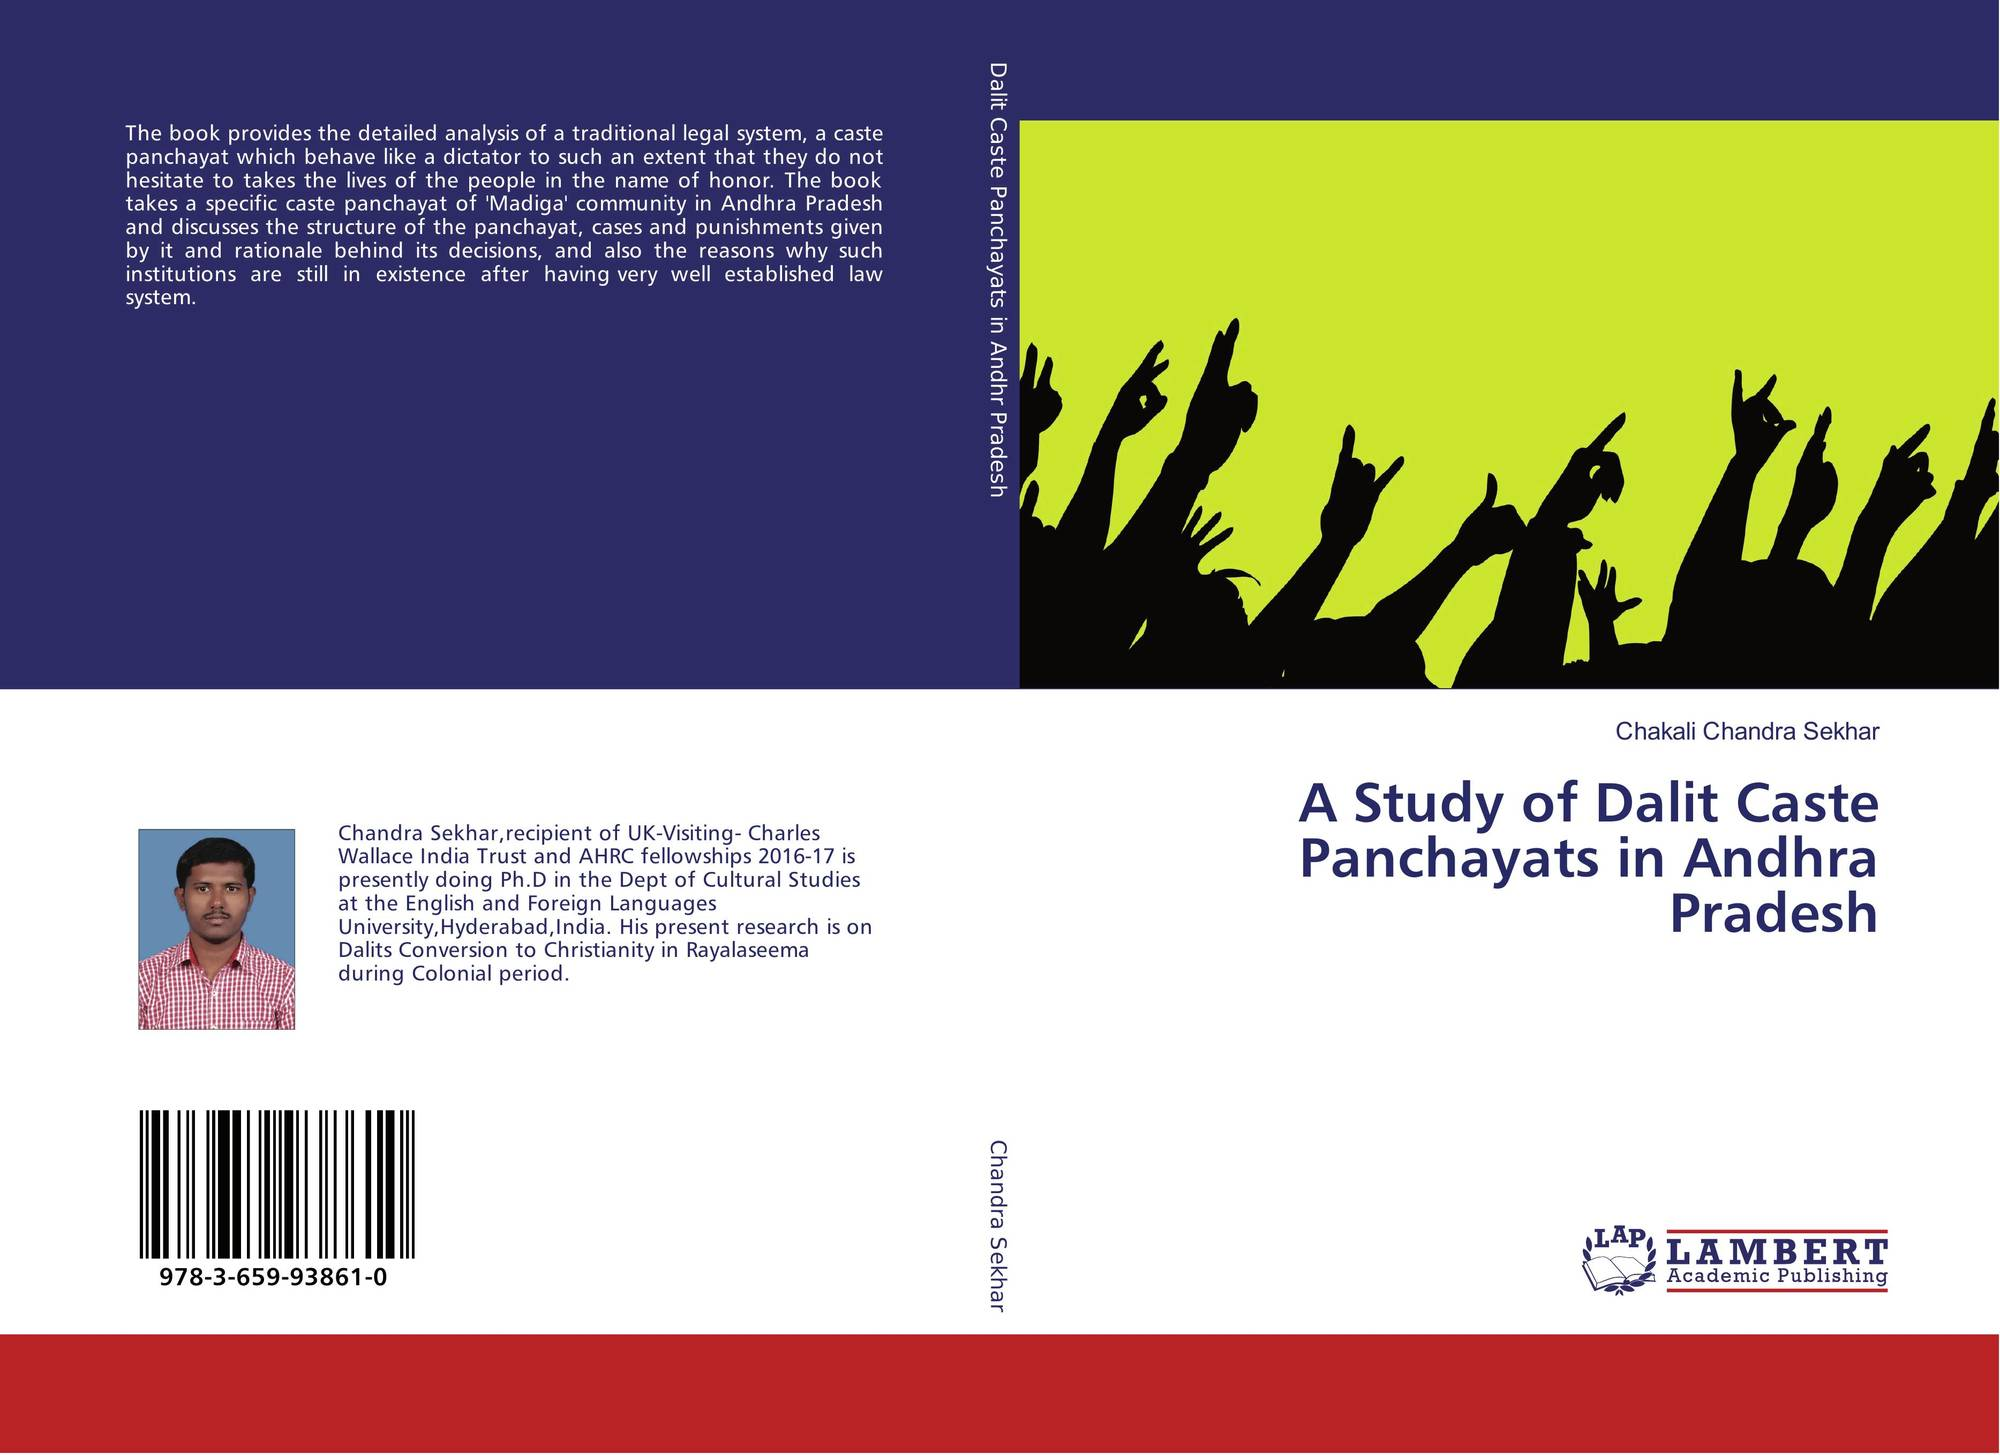 A Study of Dalit Caste Panchayats in Andhra Pradesh, 978-3-659-93861